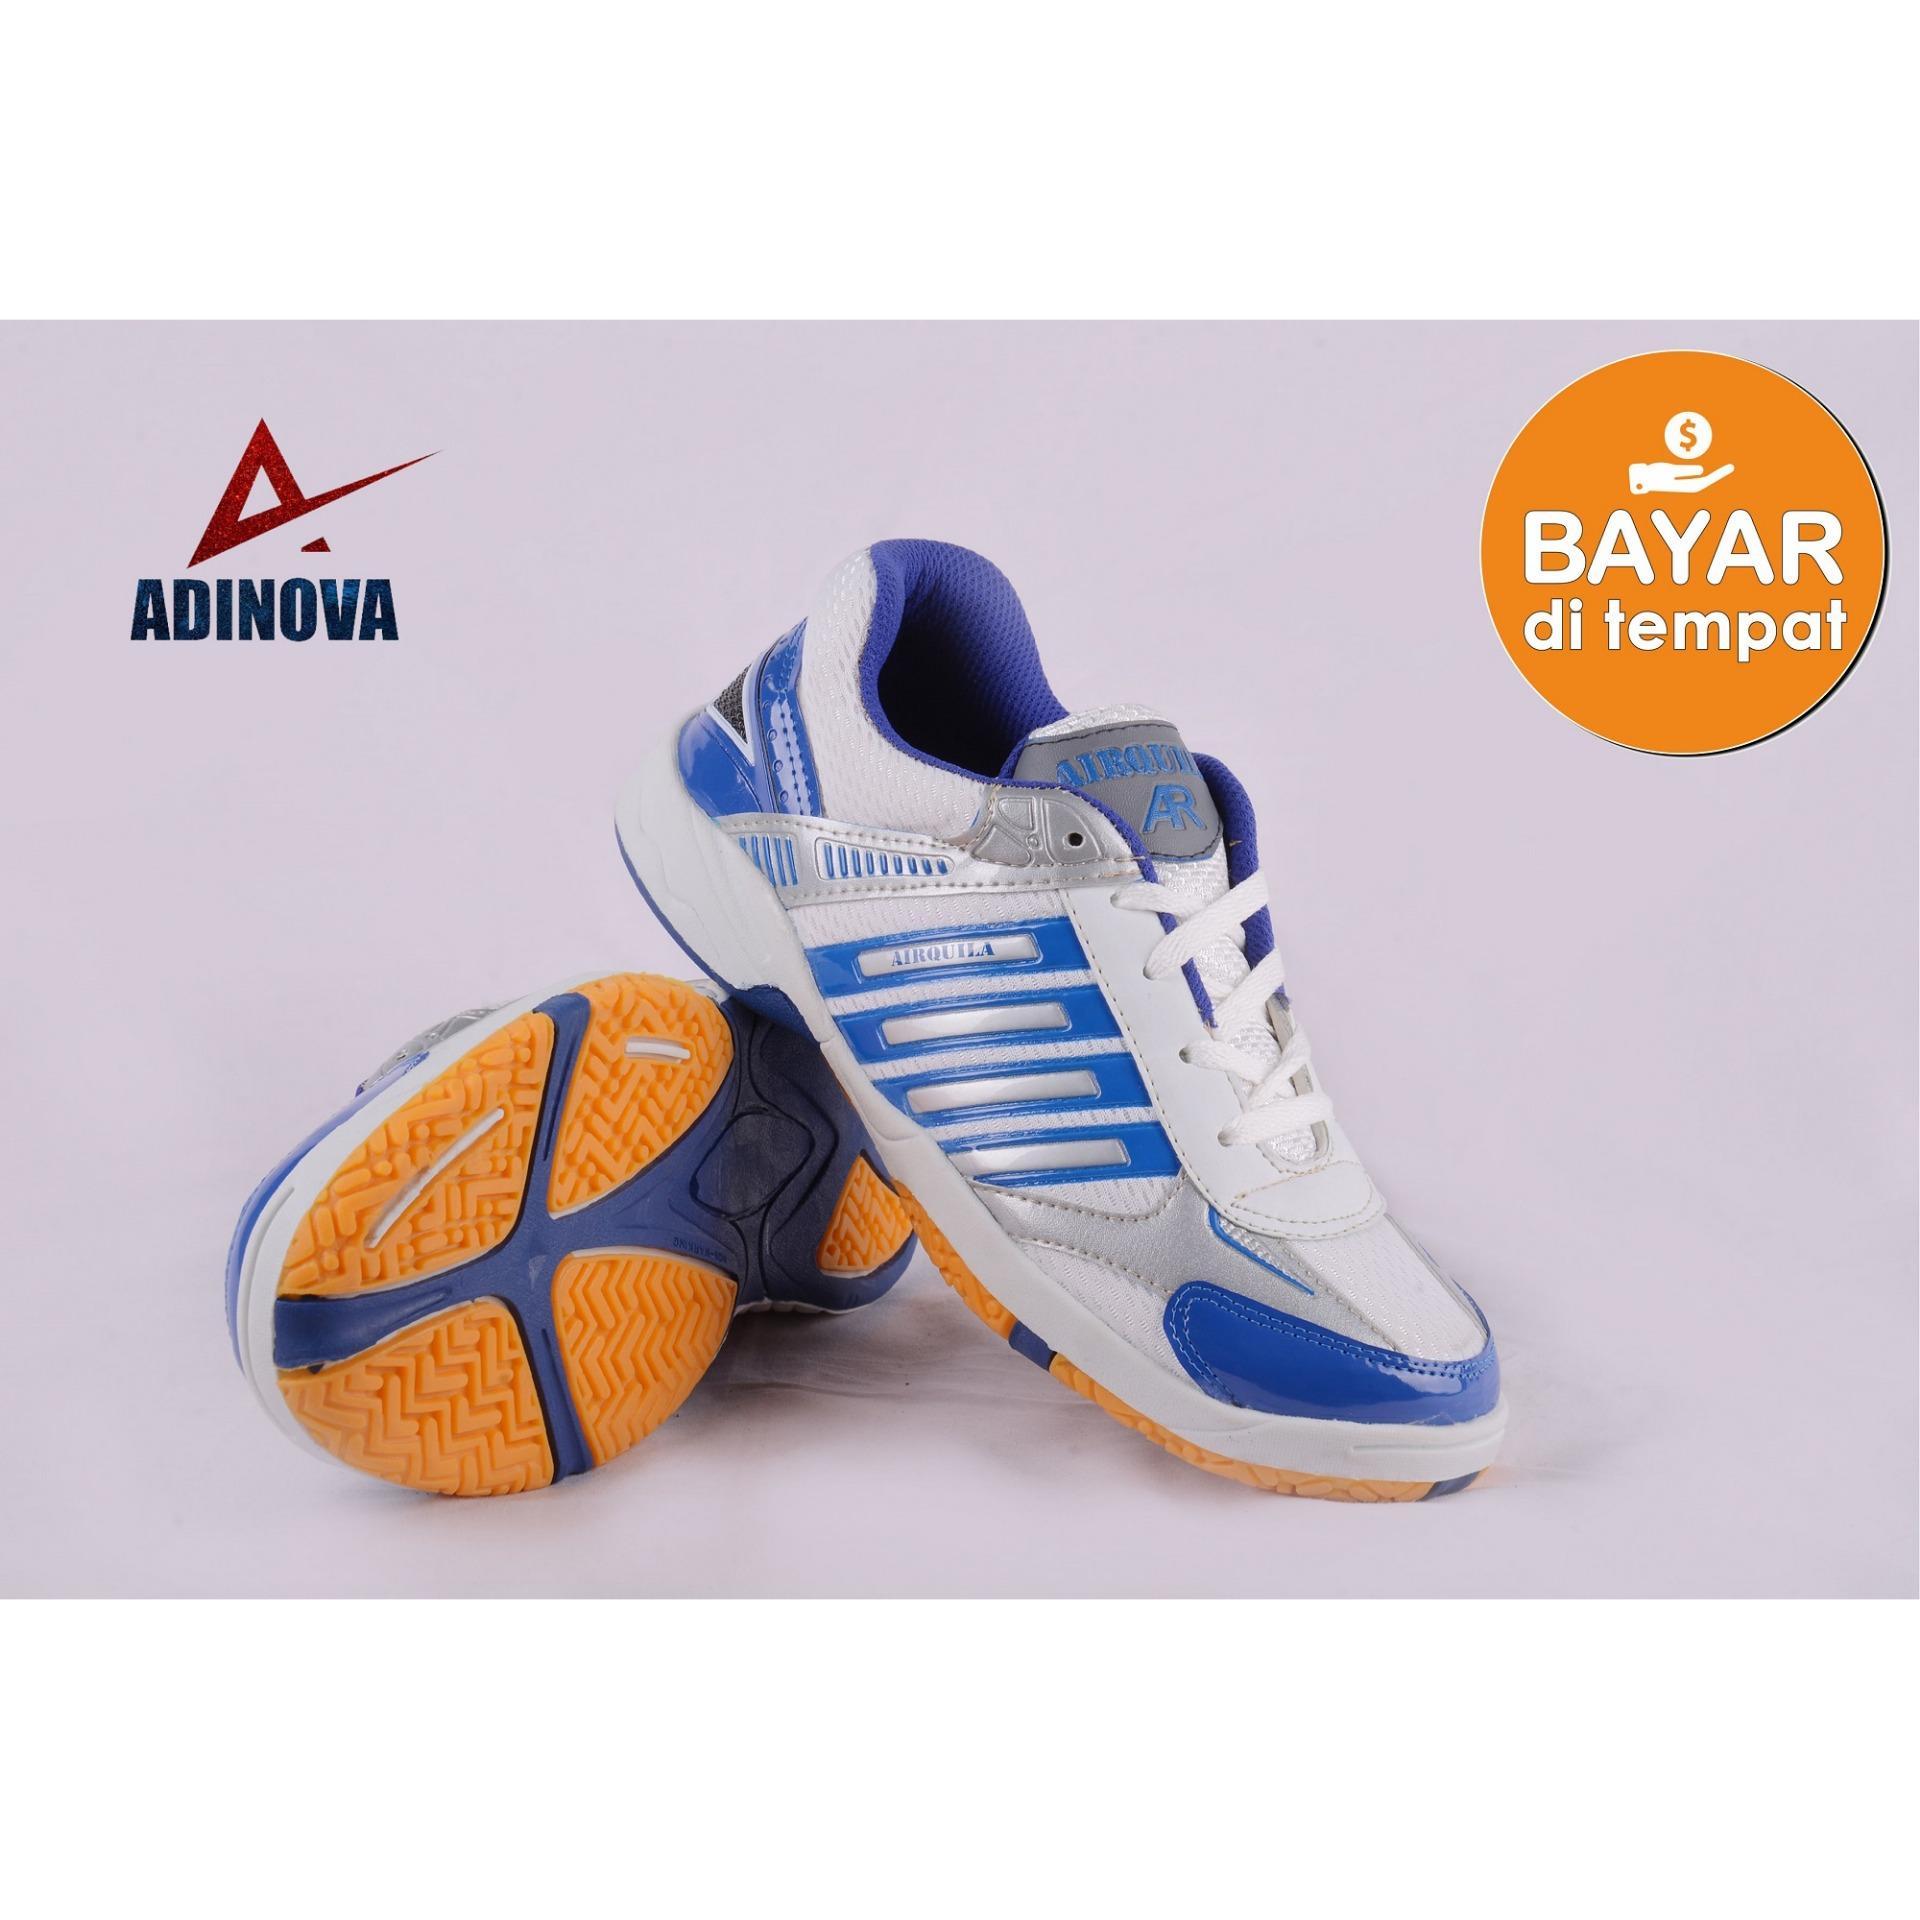 Adinova Airquila Sepatu Pria Sport dan Santai Keren Murah Kece A04 - New  Series 2297dd5a1d